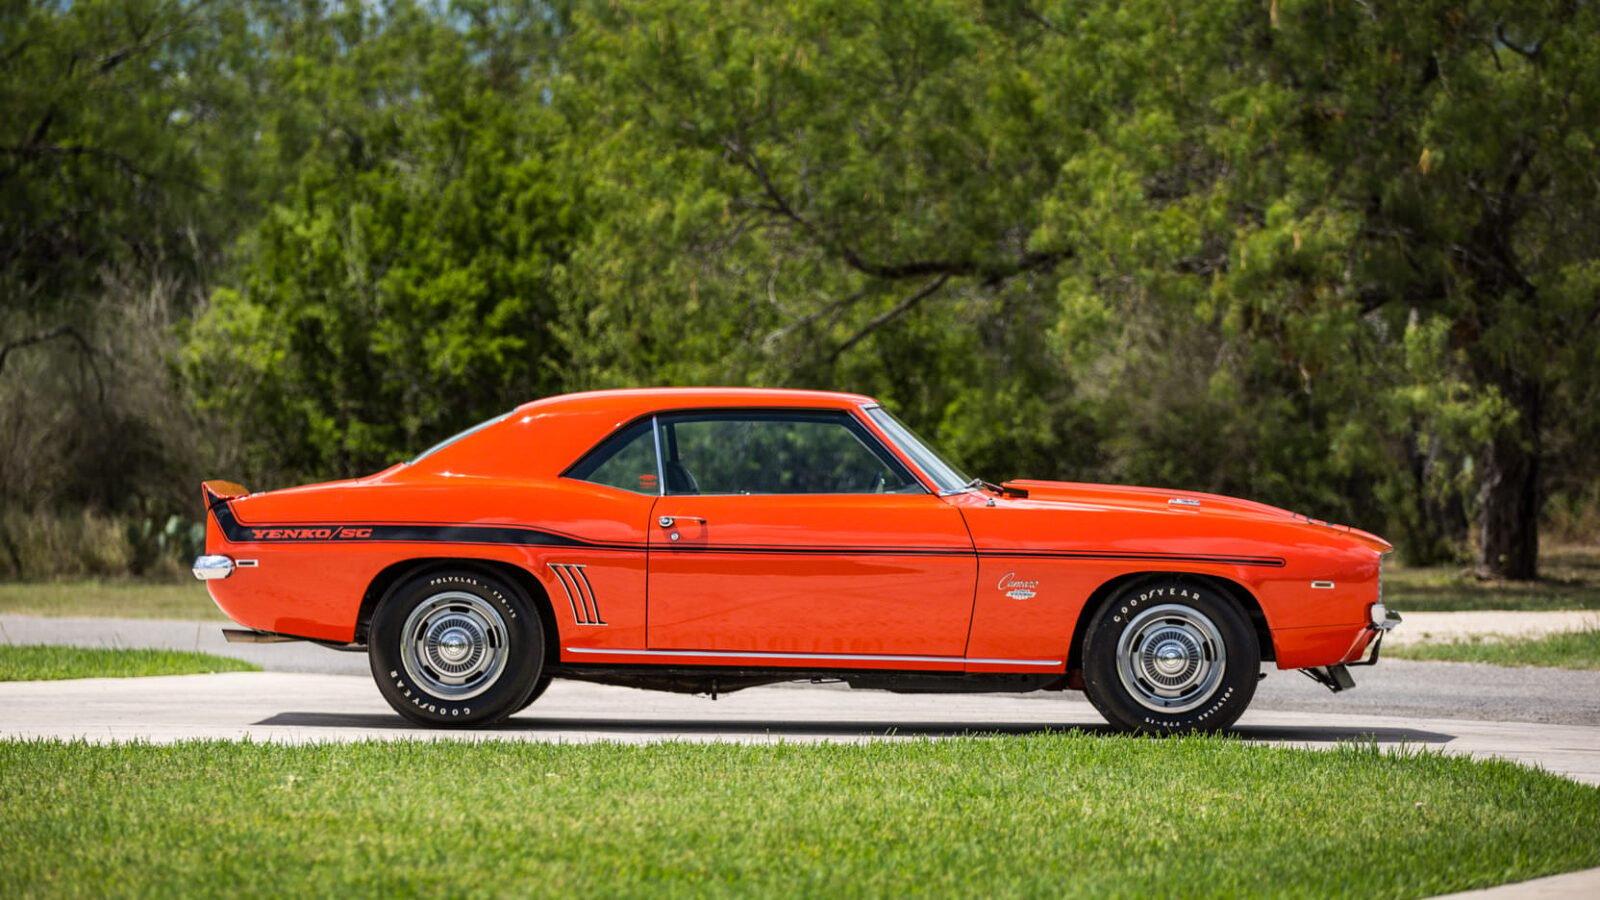 Yenko Camaro For Sale >> 1969 Chevrolet Yenko Camaro